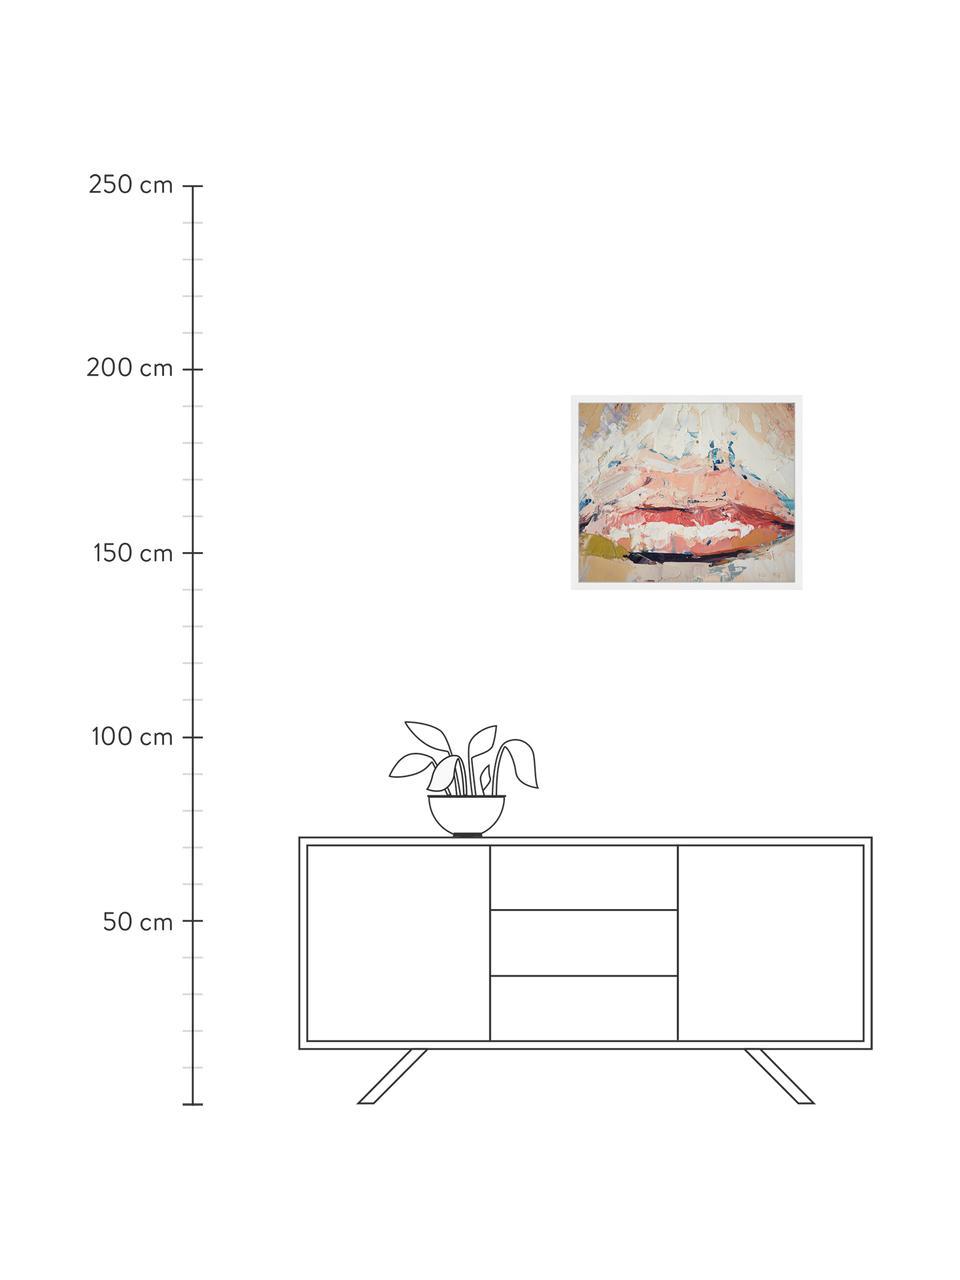 Gerahmter Digitaldruck Kiss Me, Bild: Digitaldruck auf Papier, , Rahmen: Holz, lackiert, Front: Plexiglas, Mehrfarbig, 63 x 53 cm